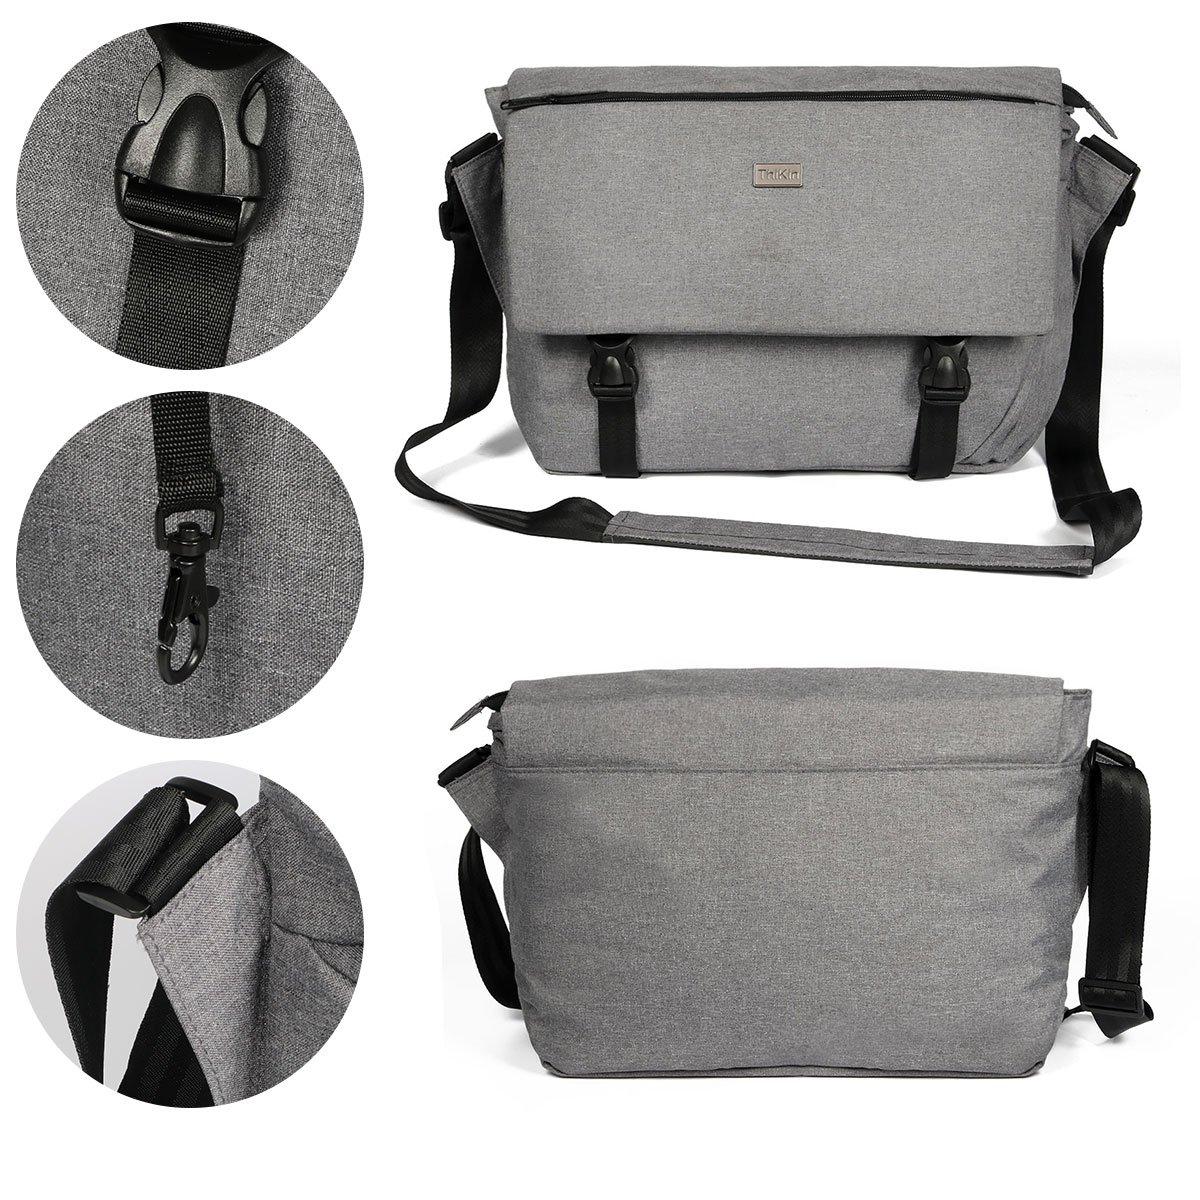 b5c8863b83 ThiKin Classic Sturdy Lightweight Casual Daily 14-Inch Laptop Messenger Bag  for Women and Men Crossbody Shoulder Bag School Satchel